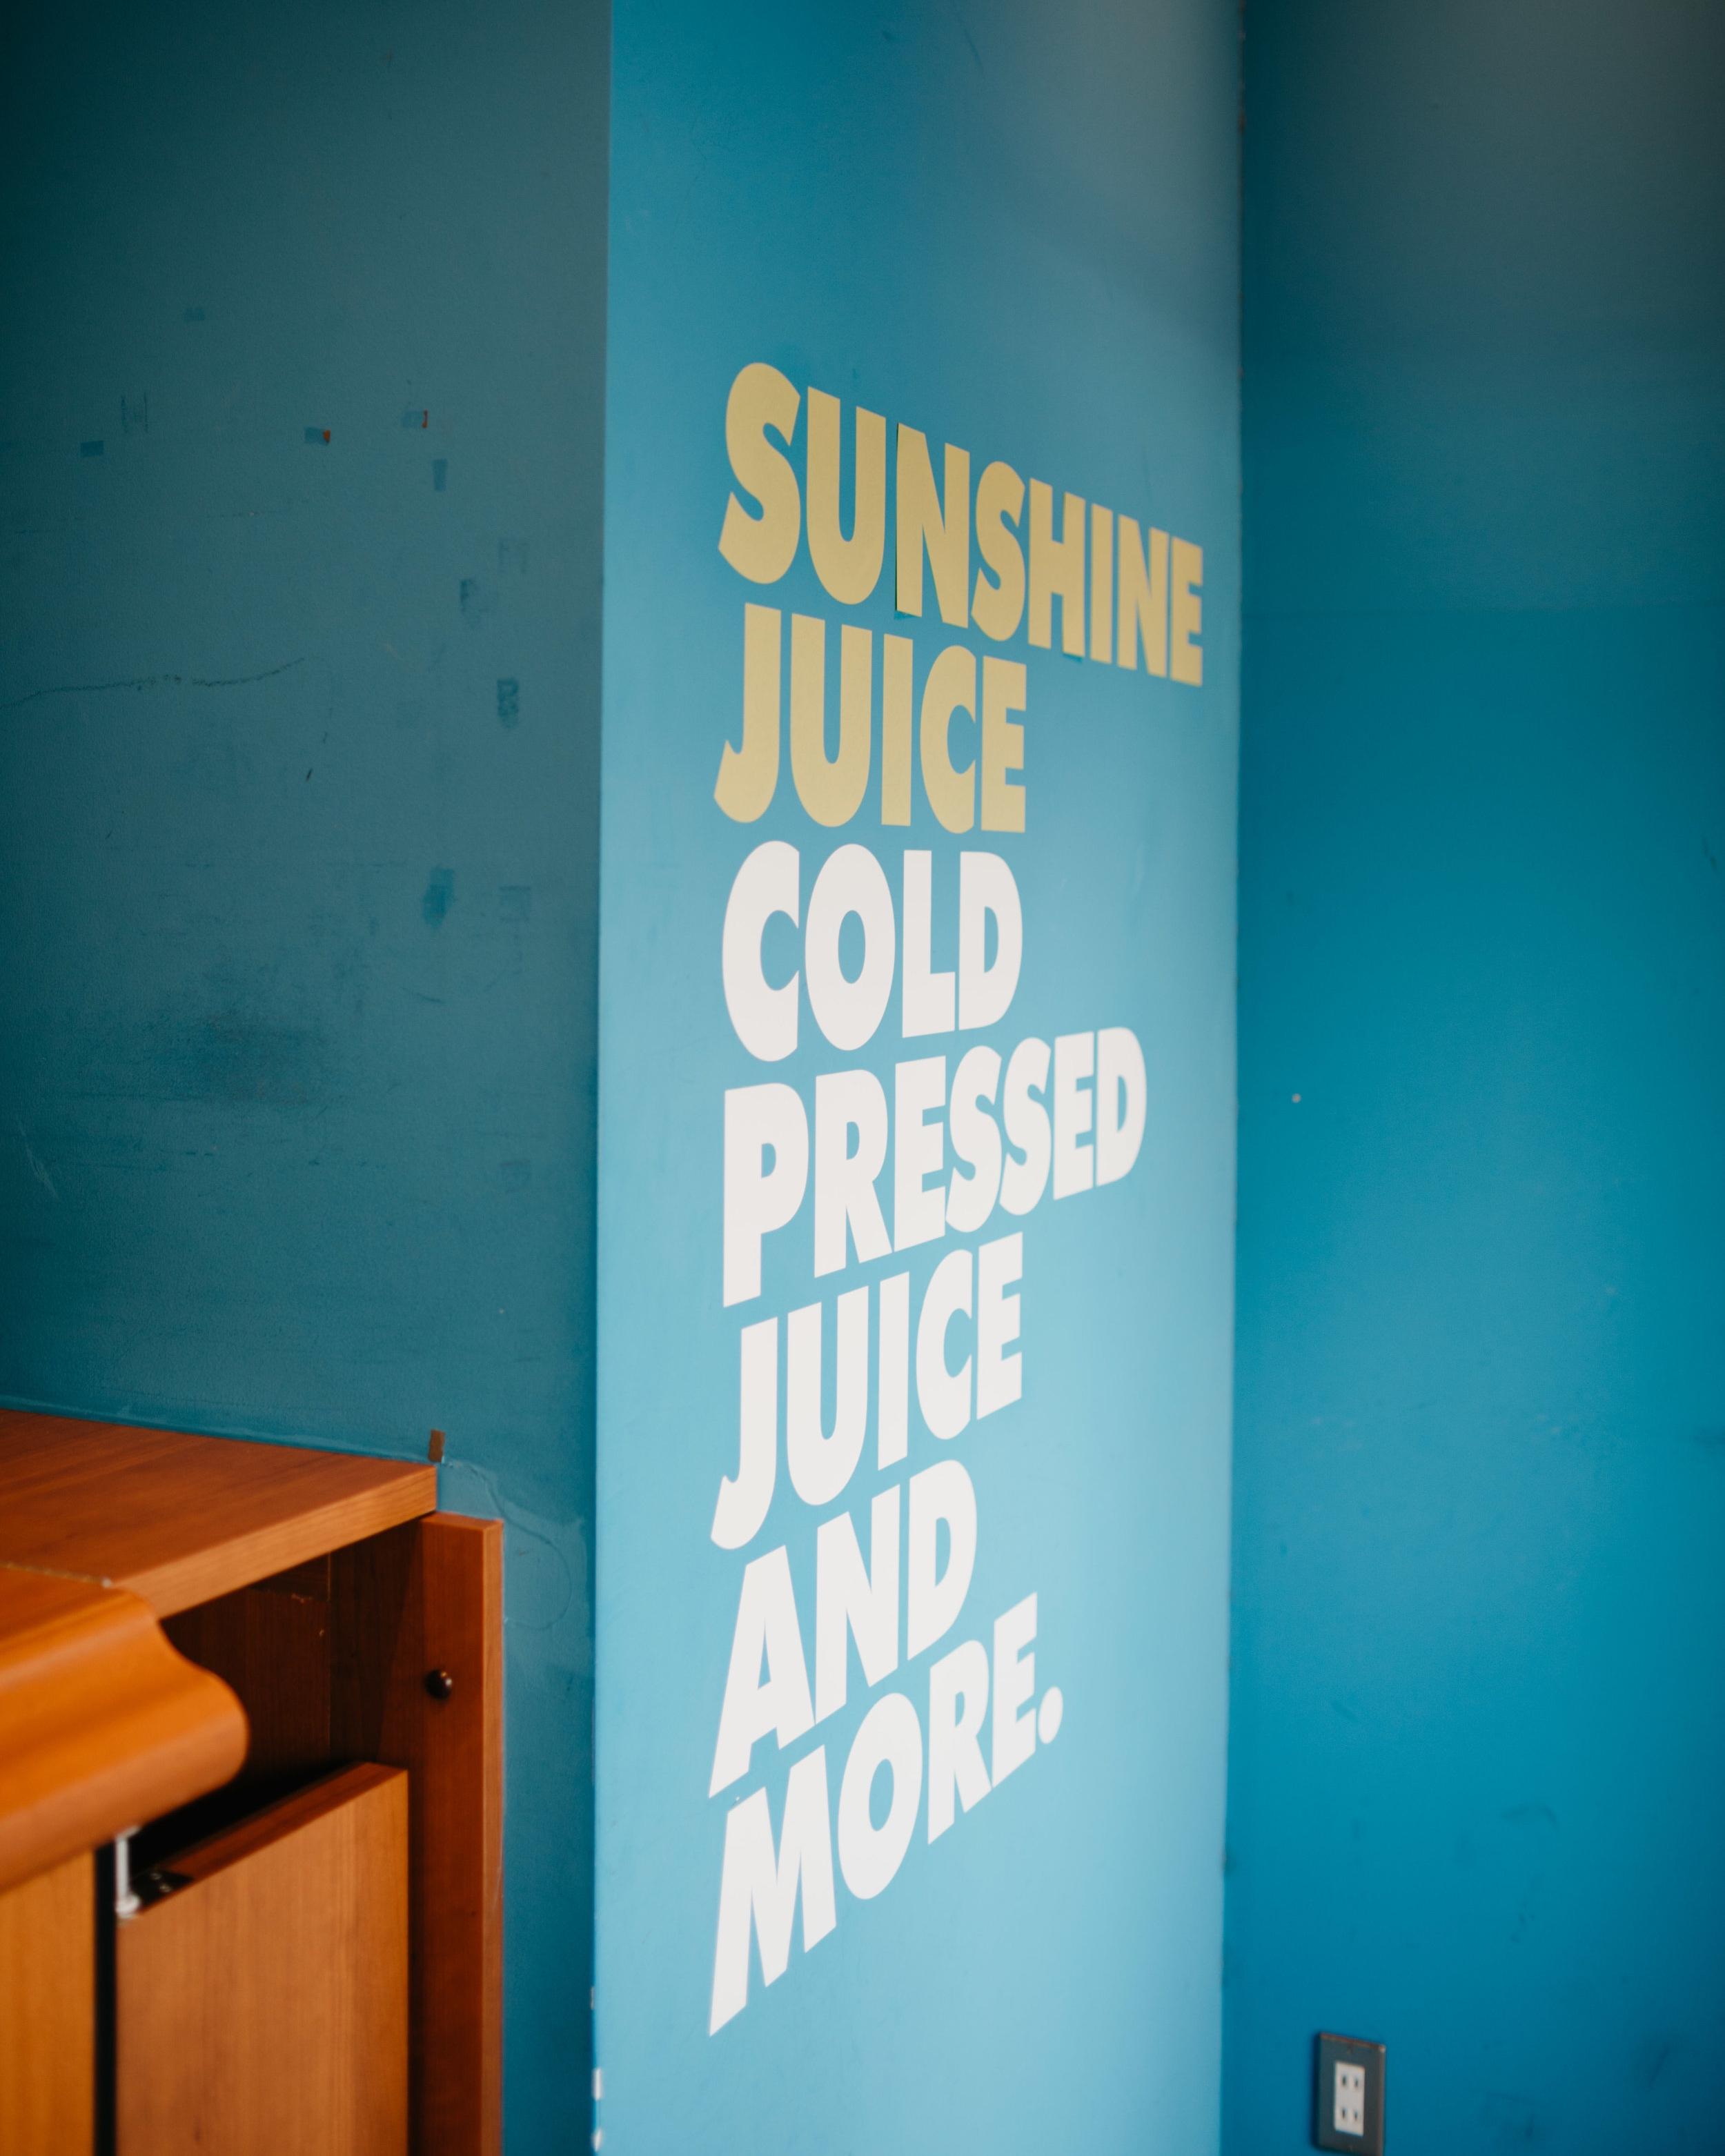 tokyo-sunshine-juice-photo-by-samantha-look.jpg